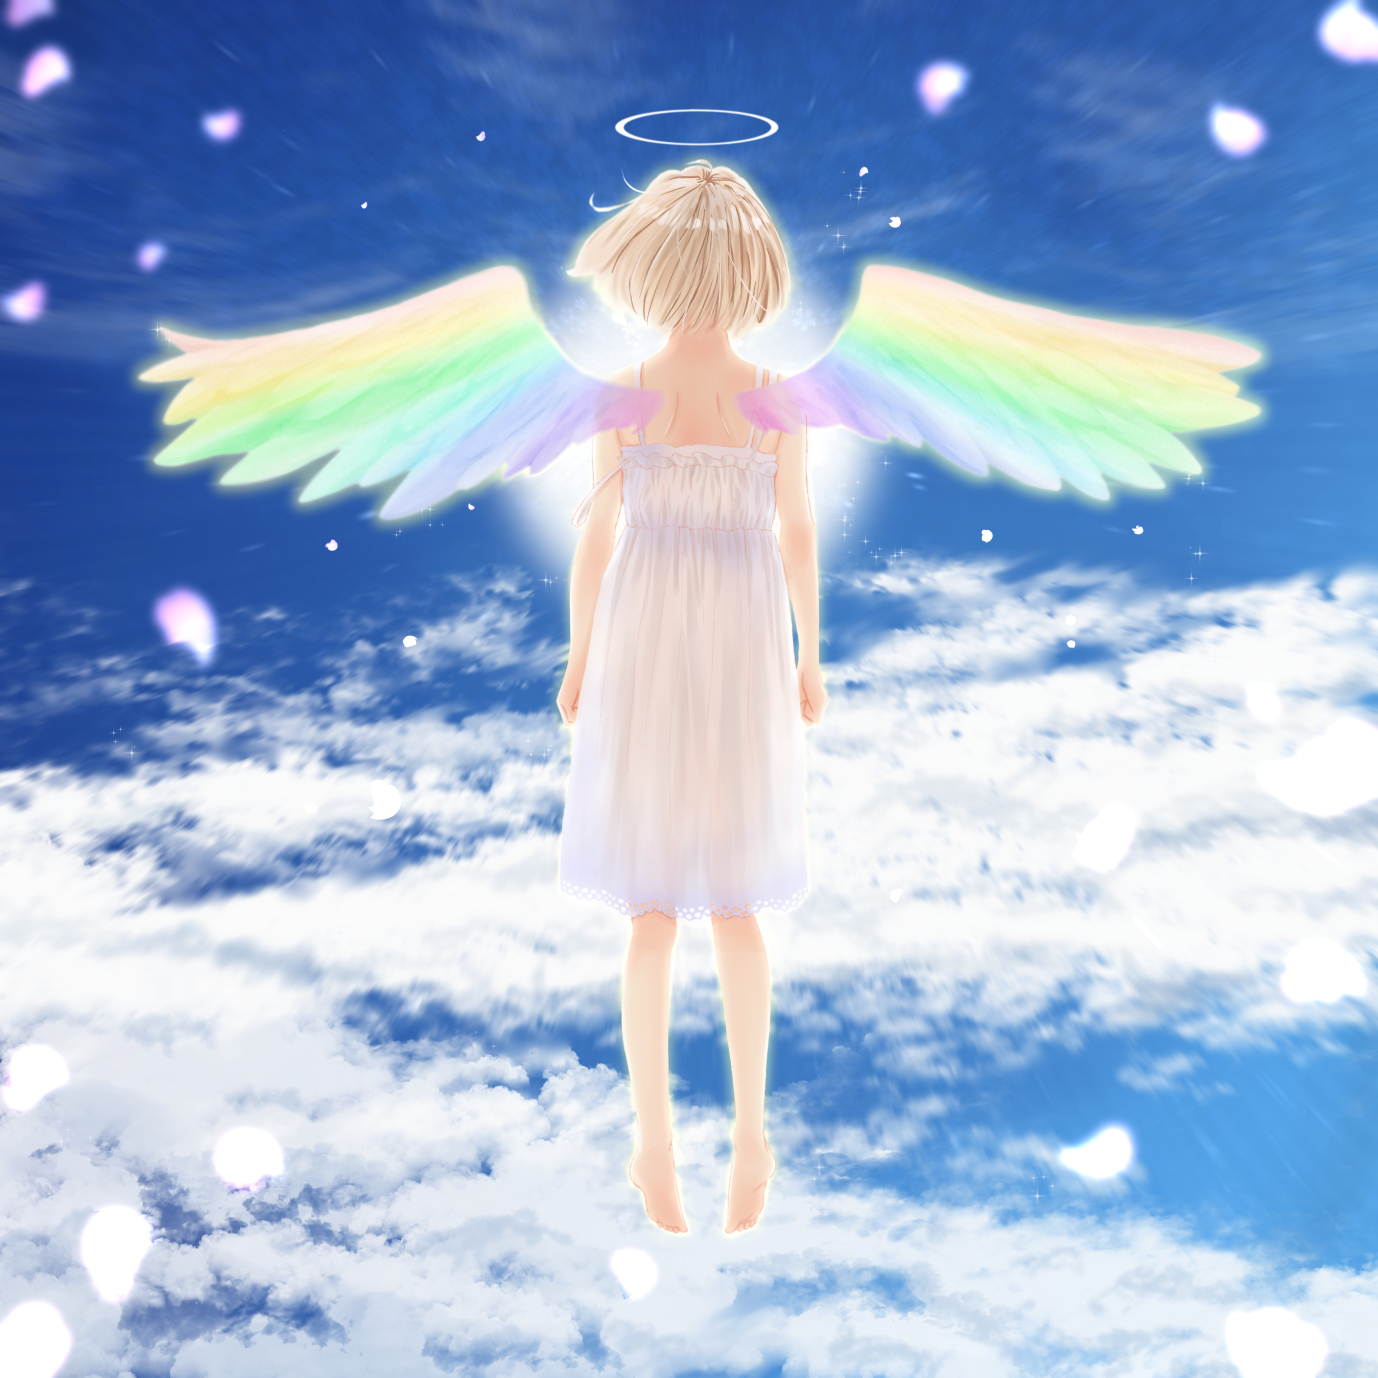 Фото Девочка-ангел с радужными крыльями, by noise_happy